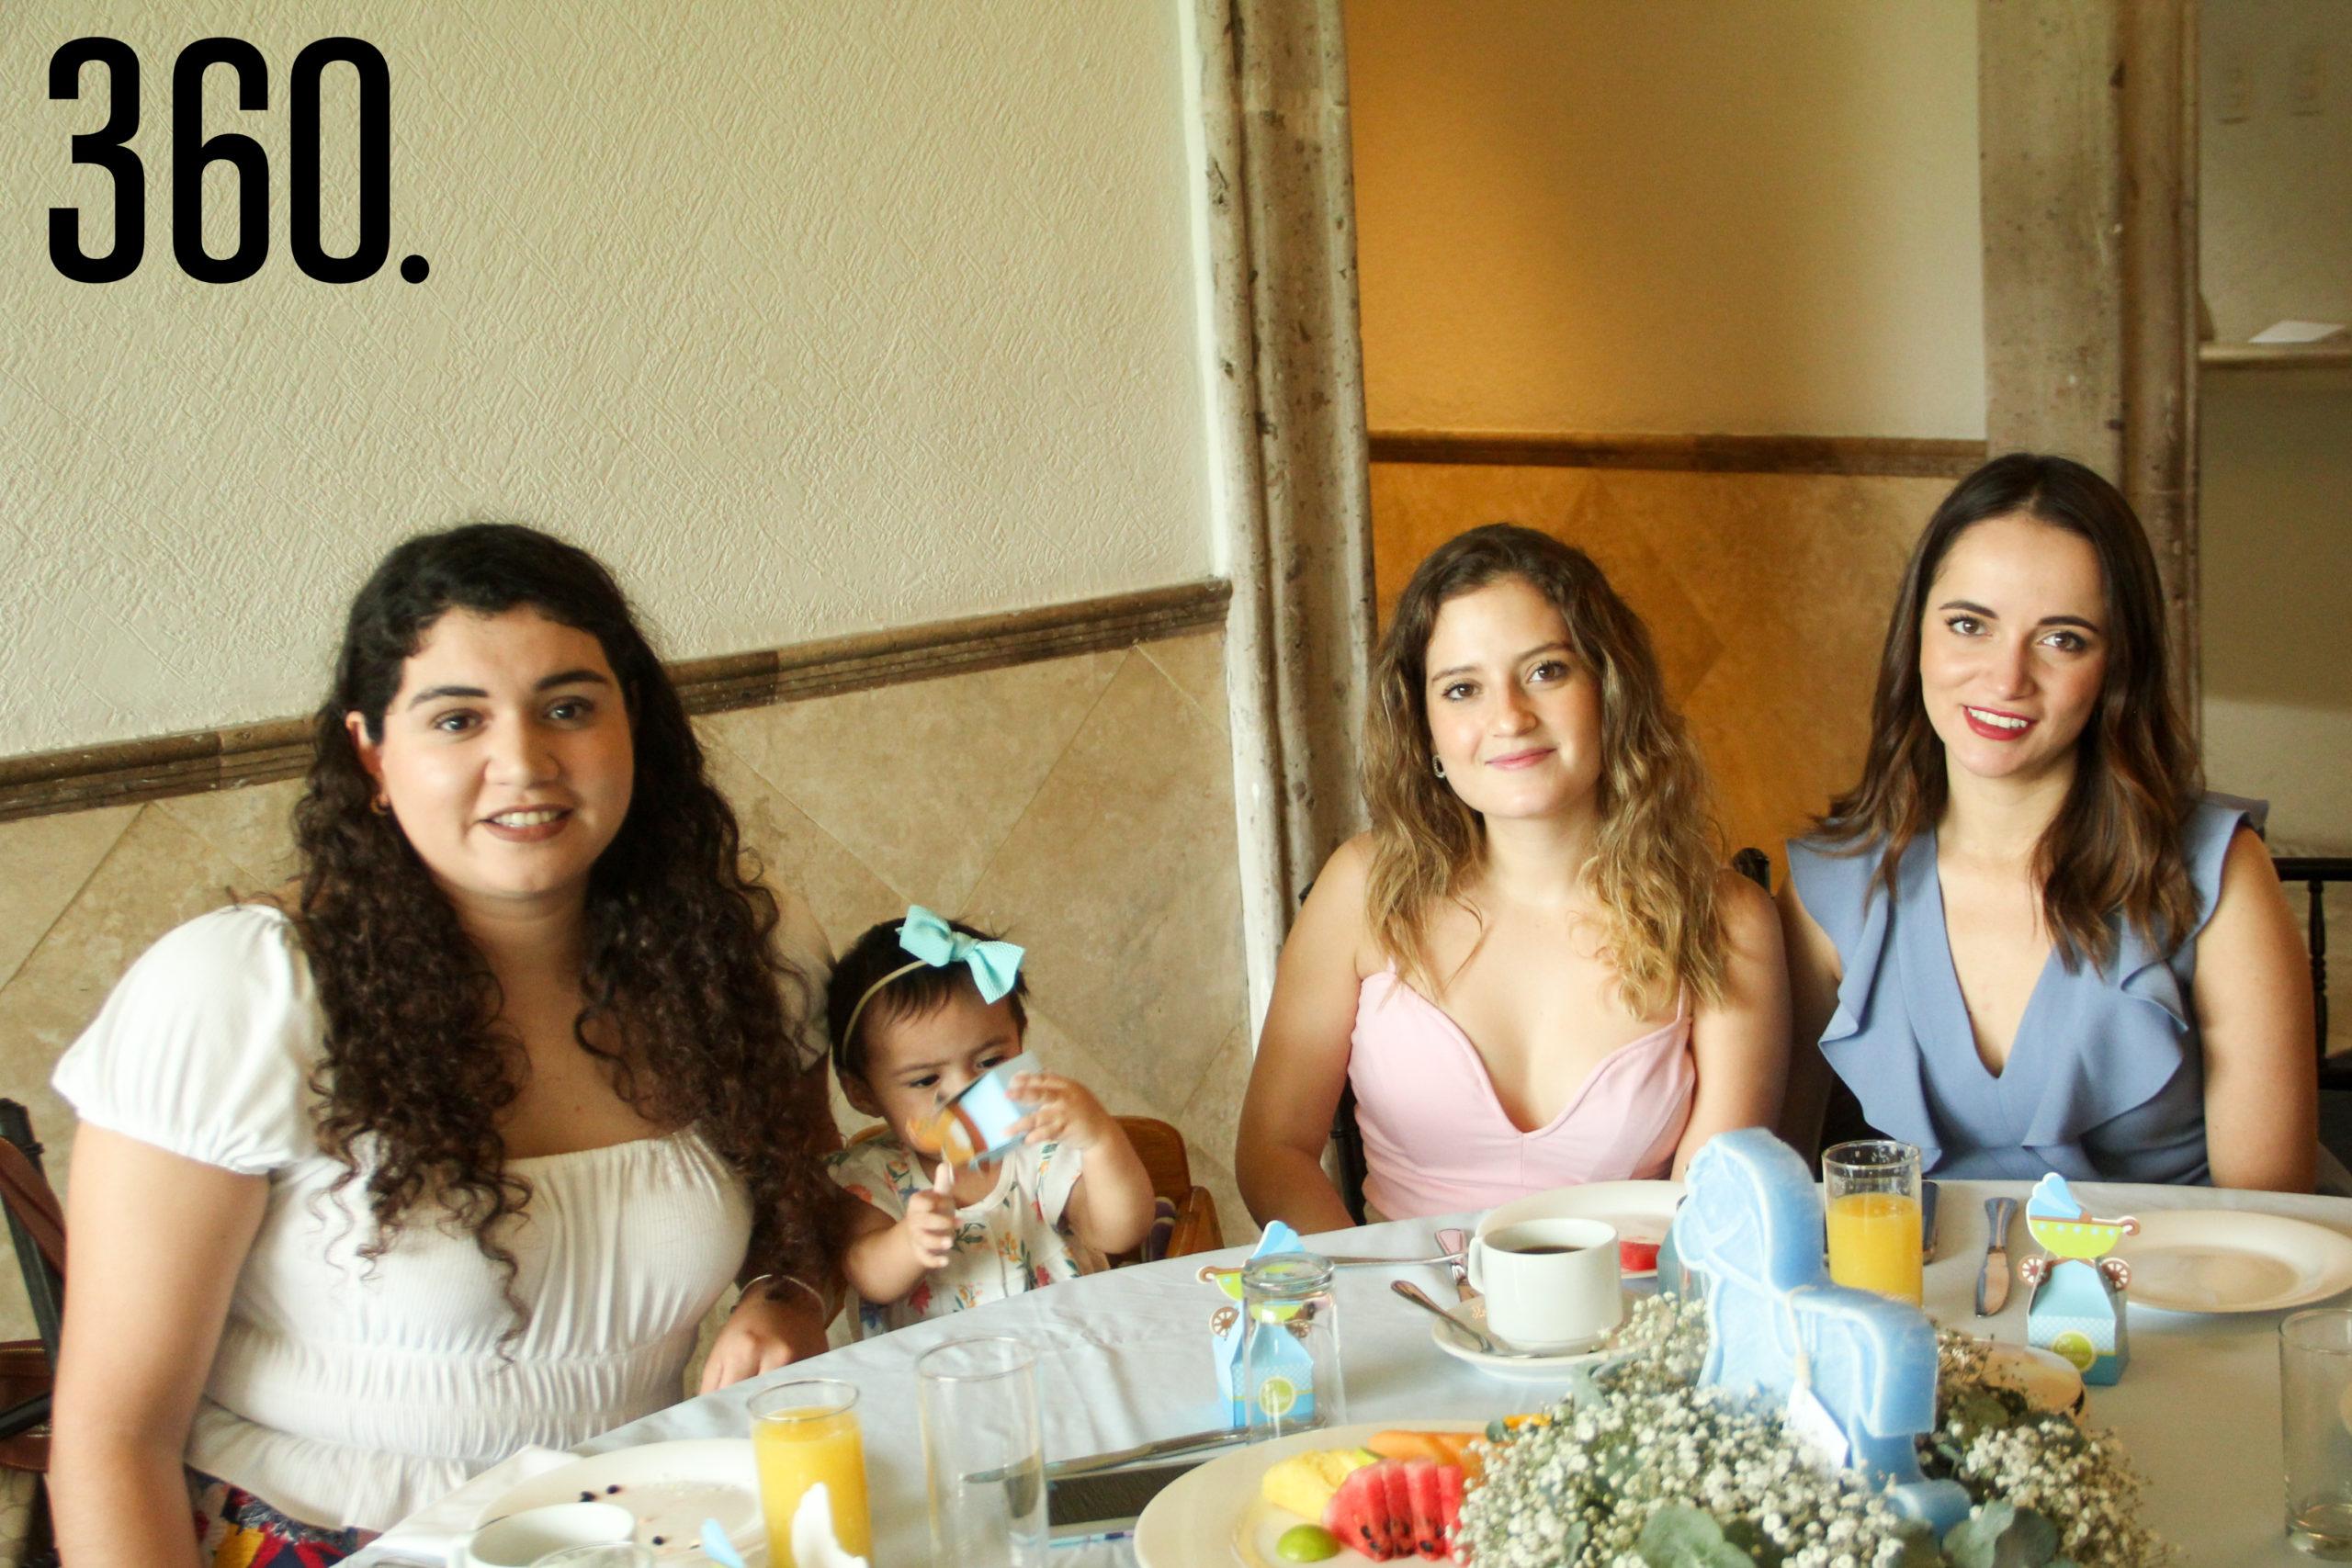 Yoselin Colunga, Rebeca, Mariana Cantú y Ana Cristina de las Fuentes.